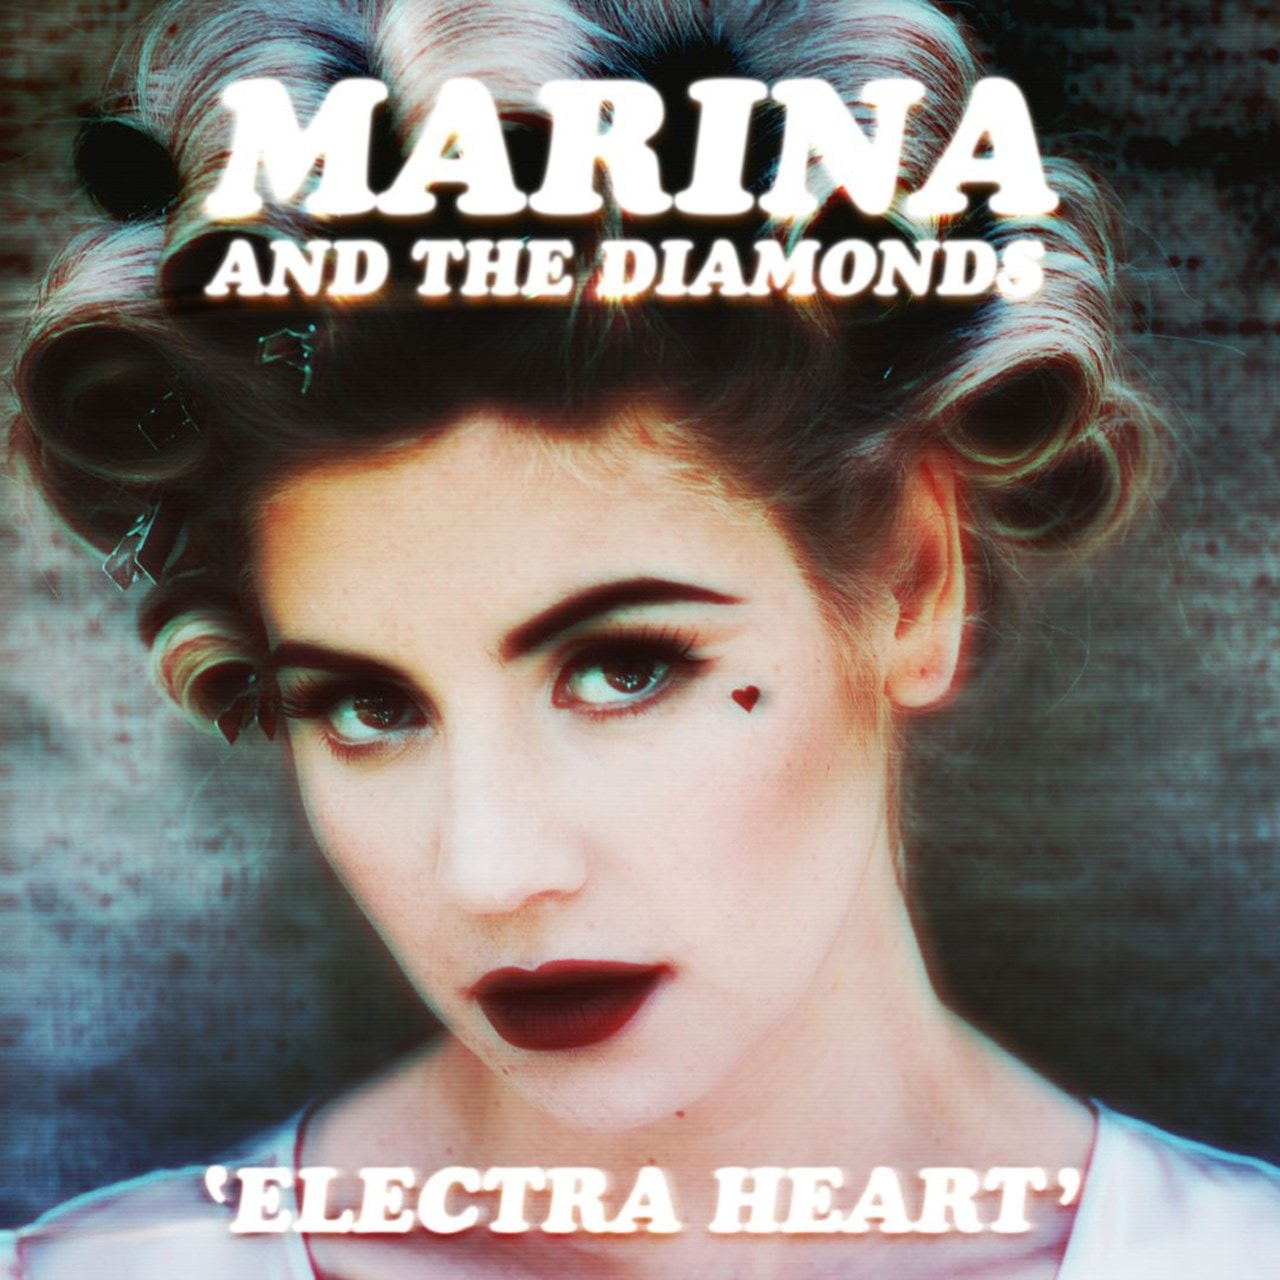 Electra Heart - 1